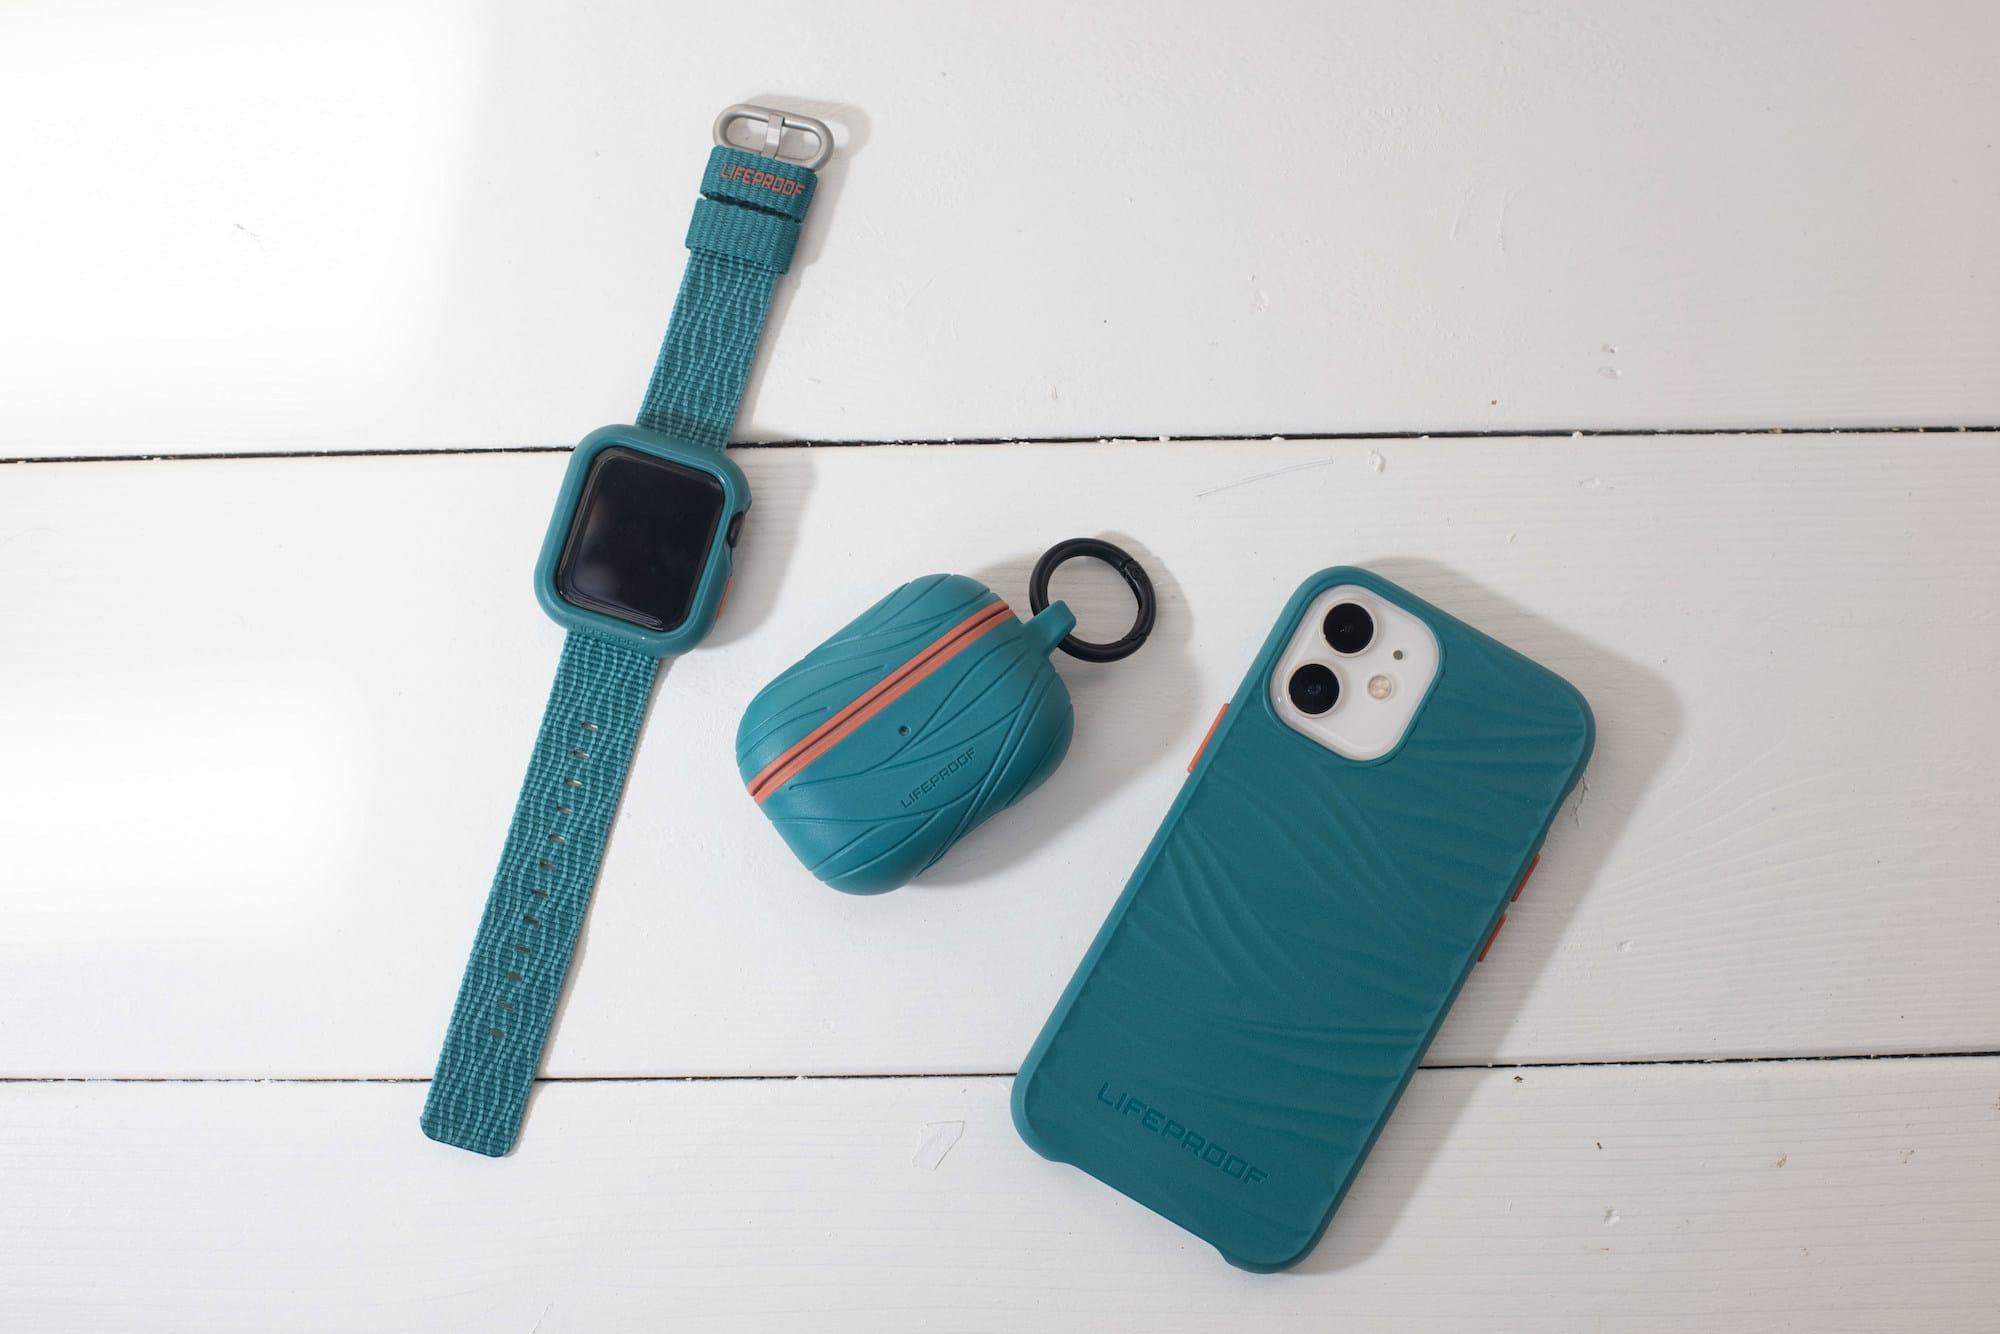 LifeProof、再生海洋プラスチック使用のAirPods/AirPods Pro/Apple Watch用ケース発売